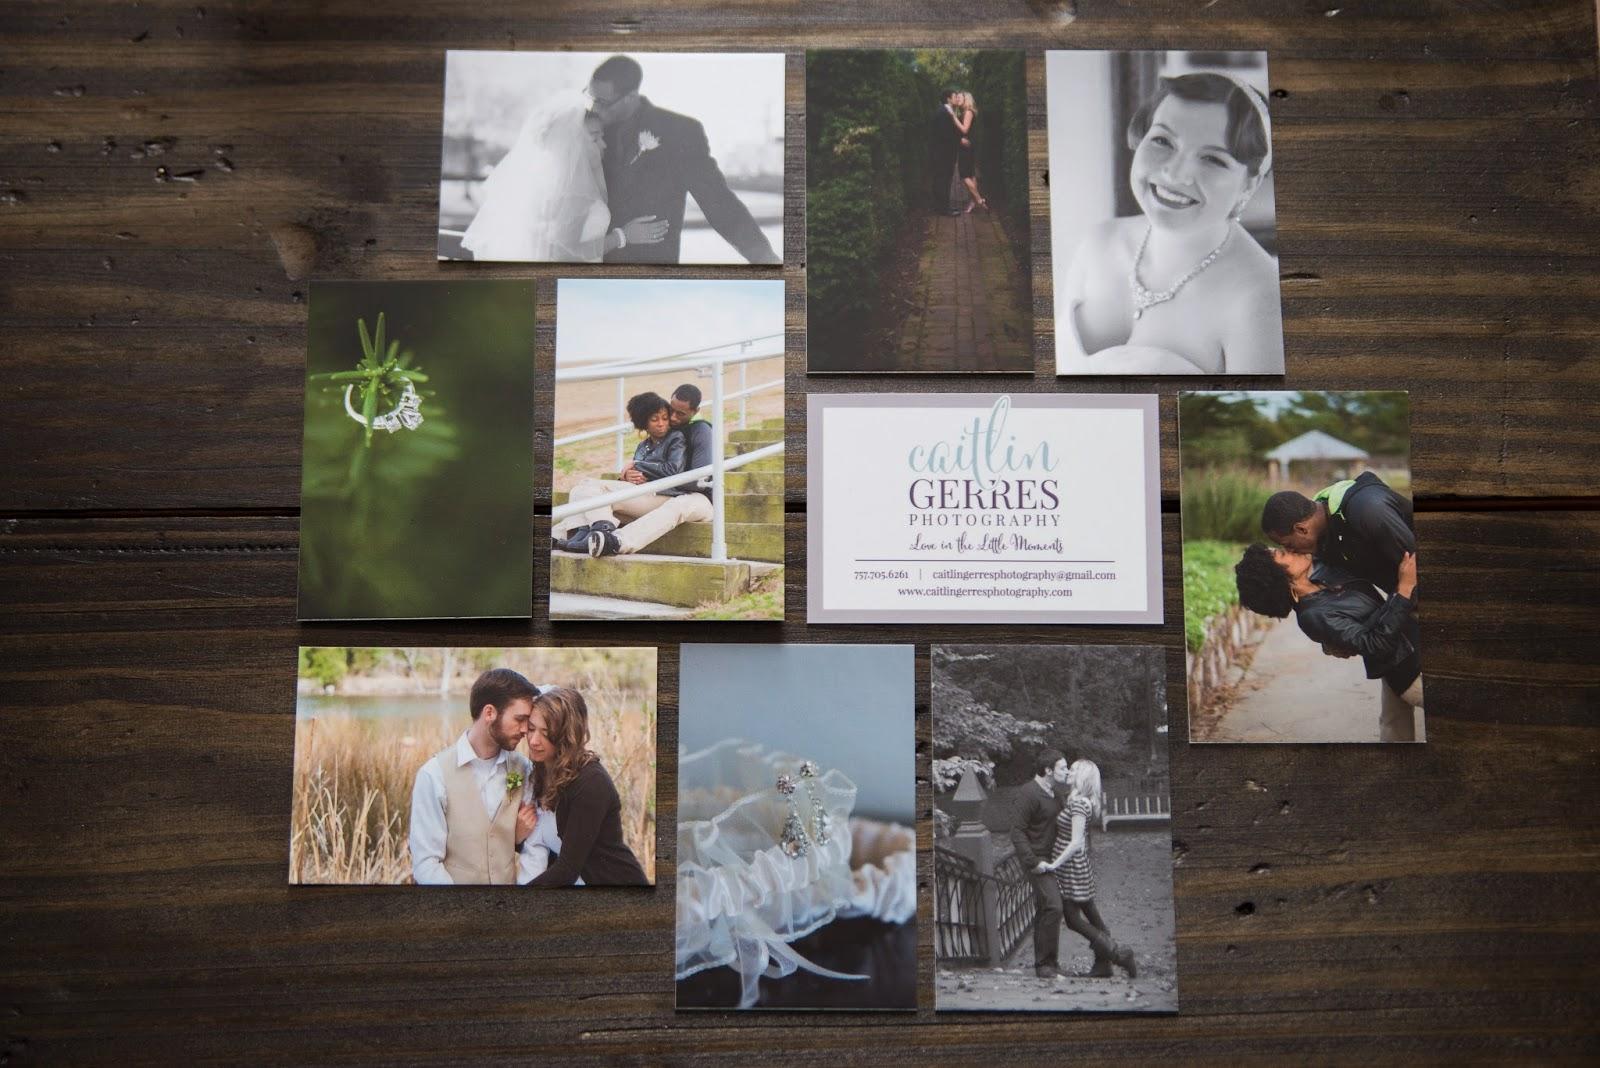 Caitlin+Gerres+Photography+Business+Cards-111.jpg